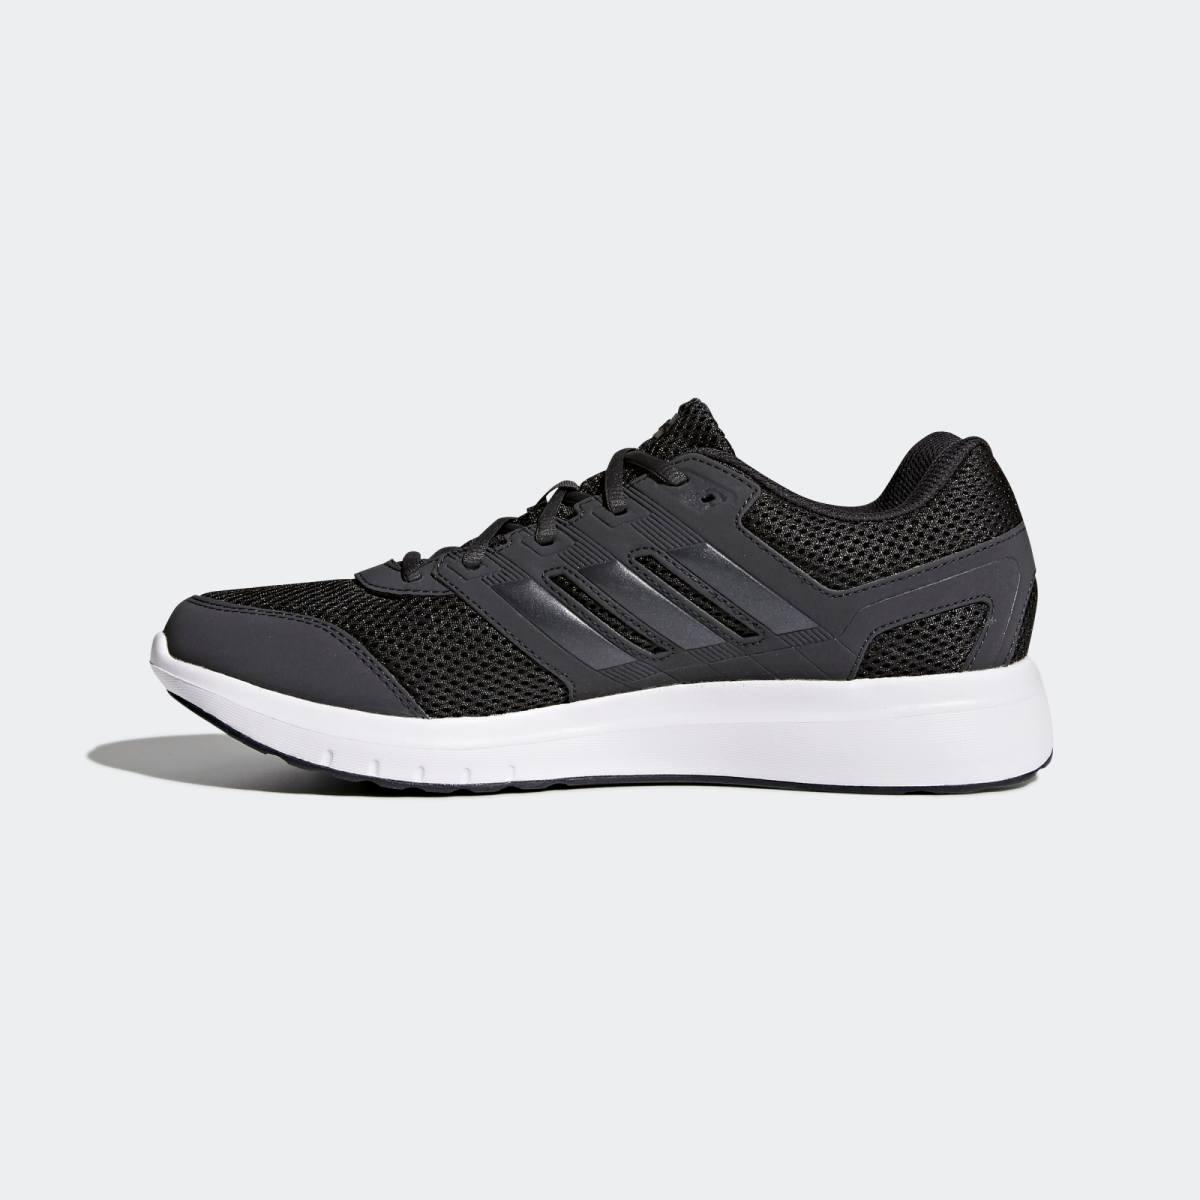 Chaussure_Duramo_Lite_2.0_Gris_CG4044_06_standard